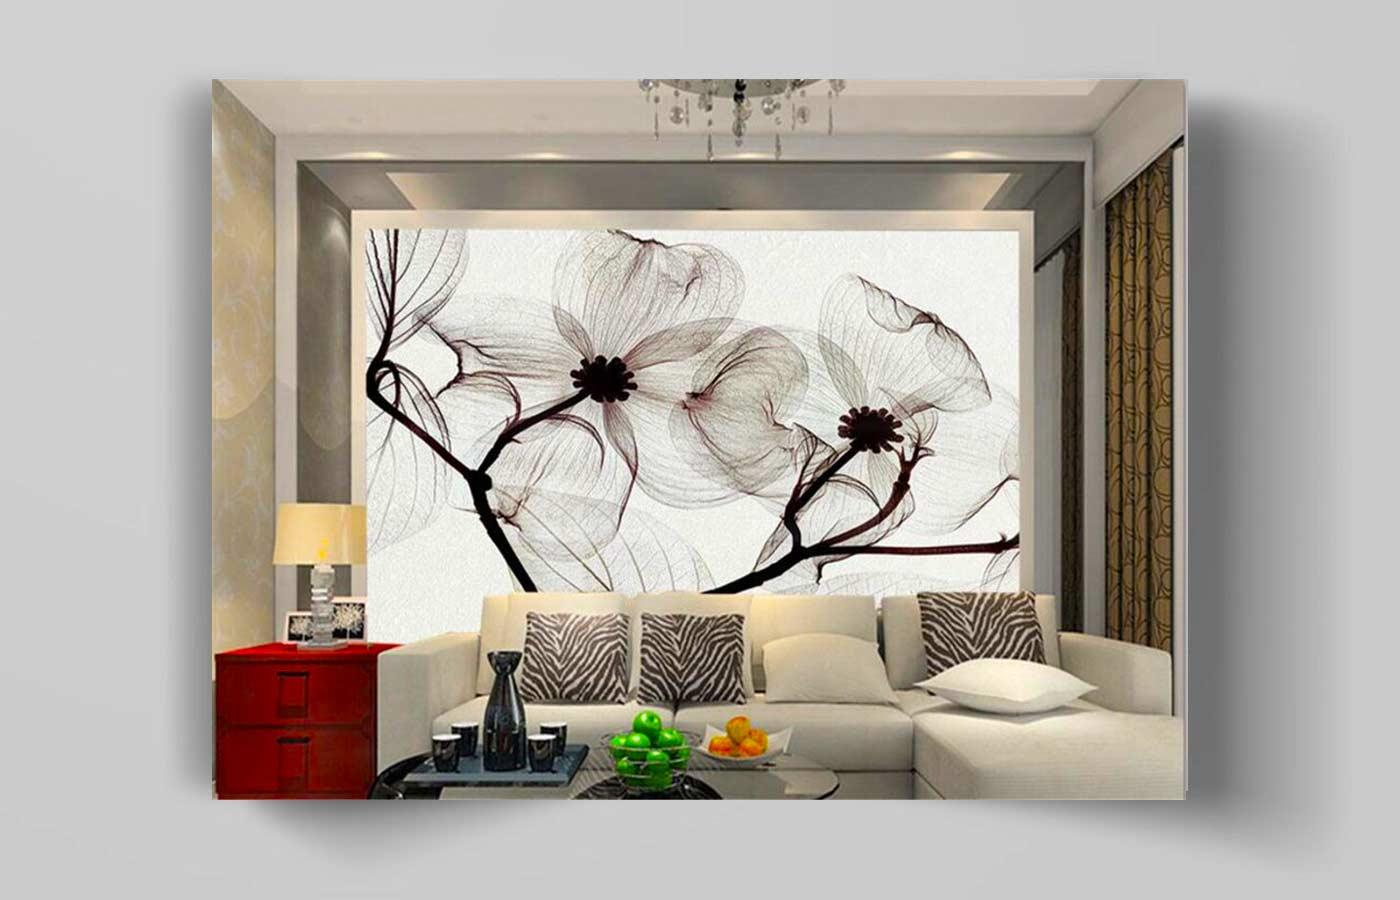 678 - انواع آویز دیواری در دکوراسیون منزل